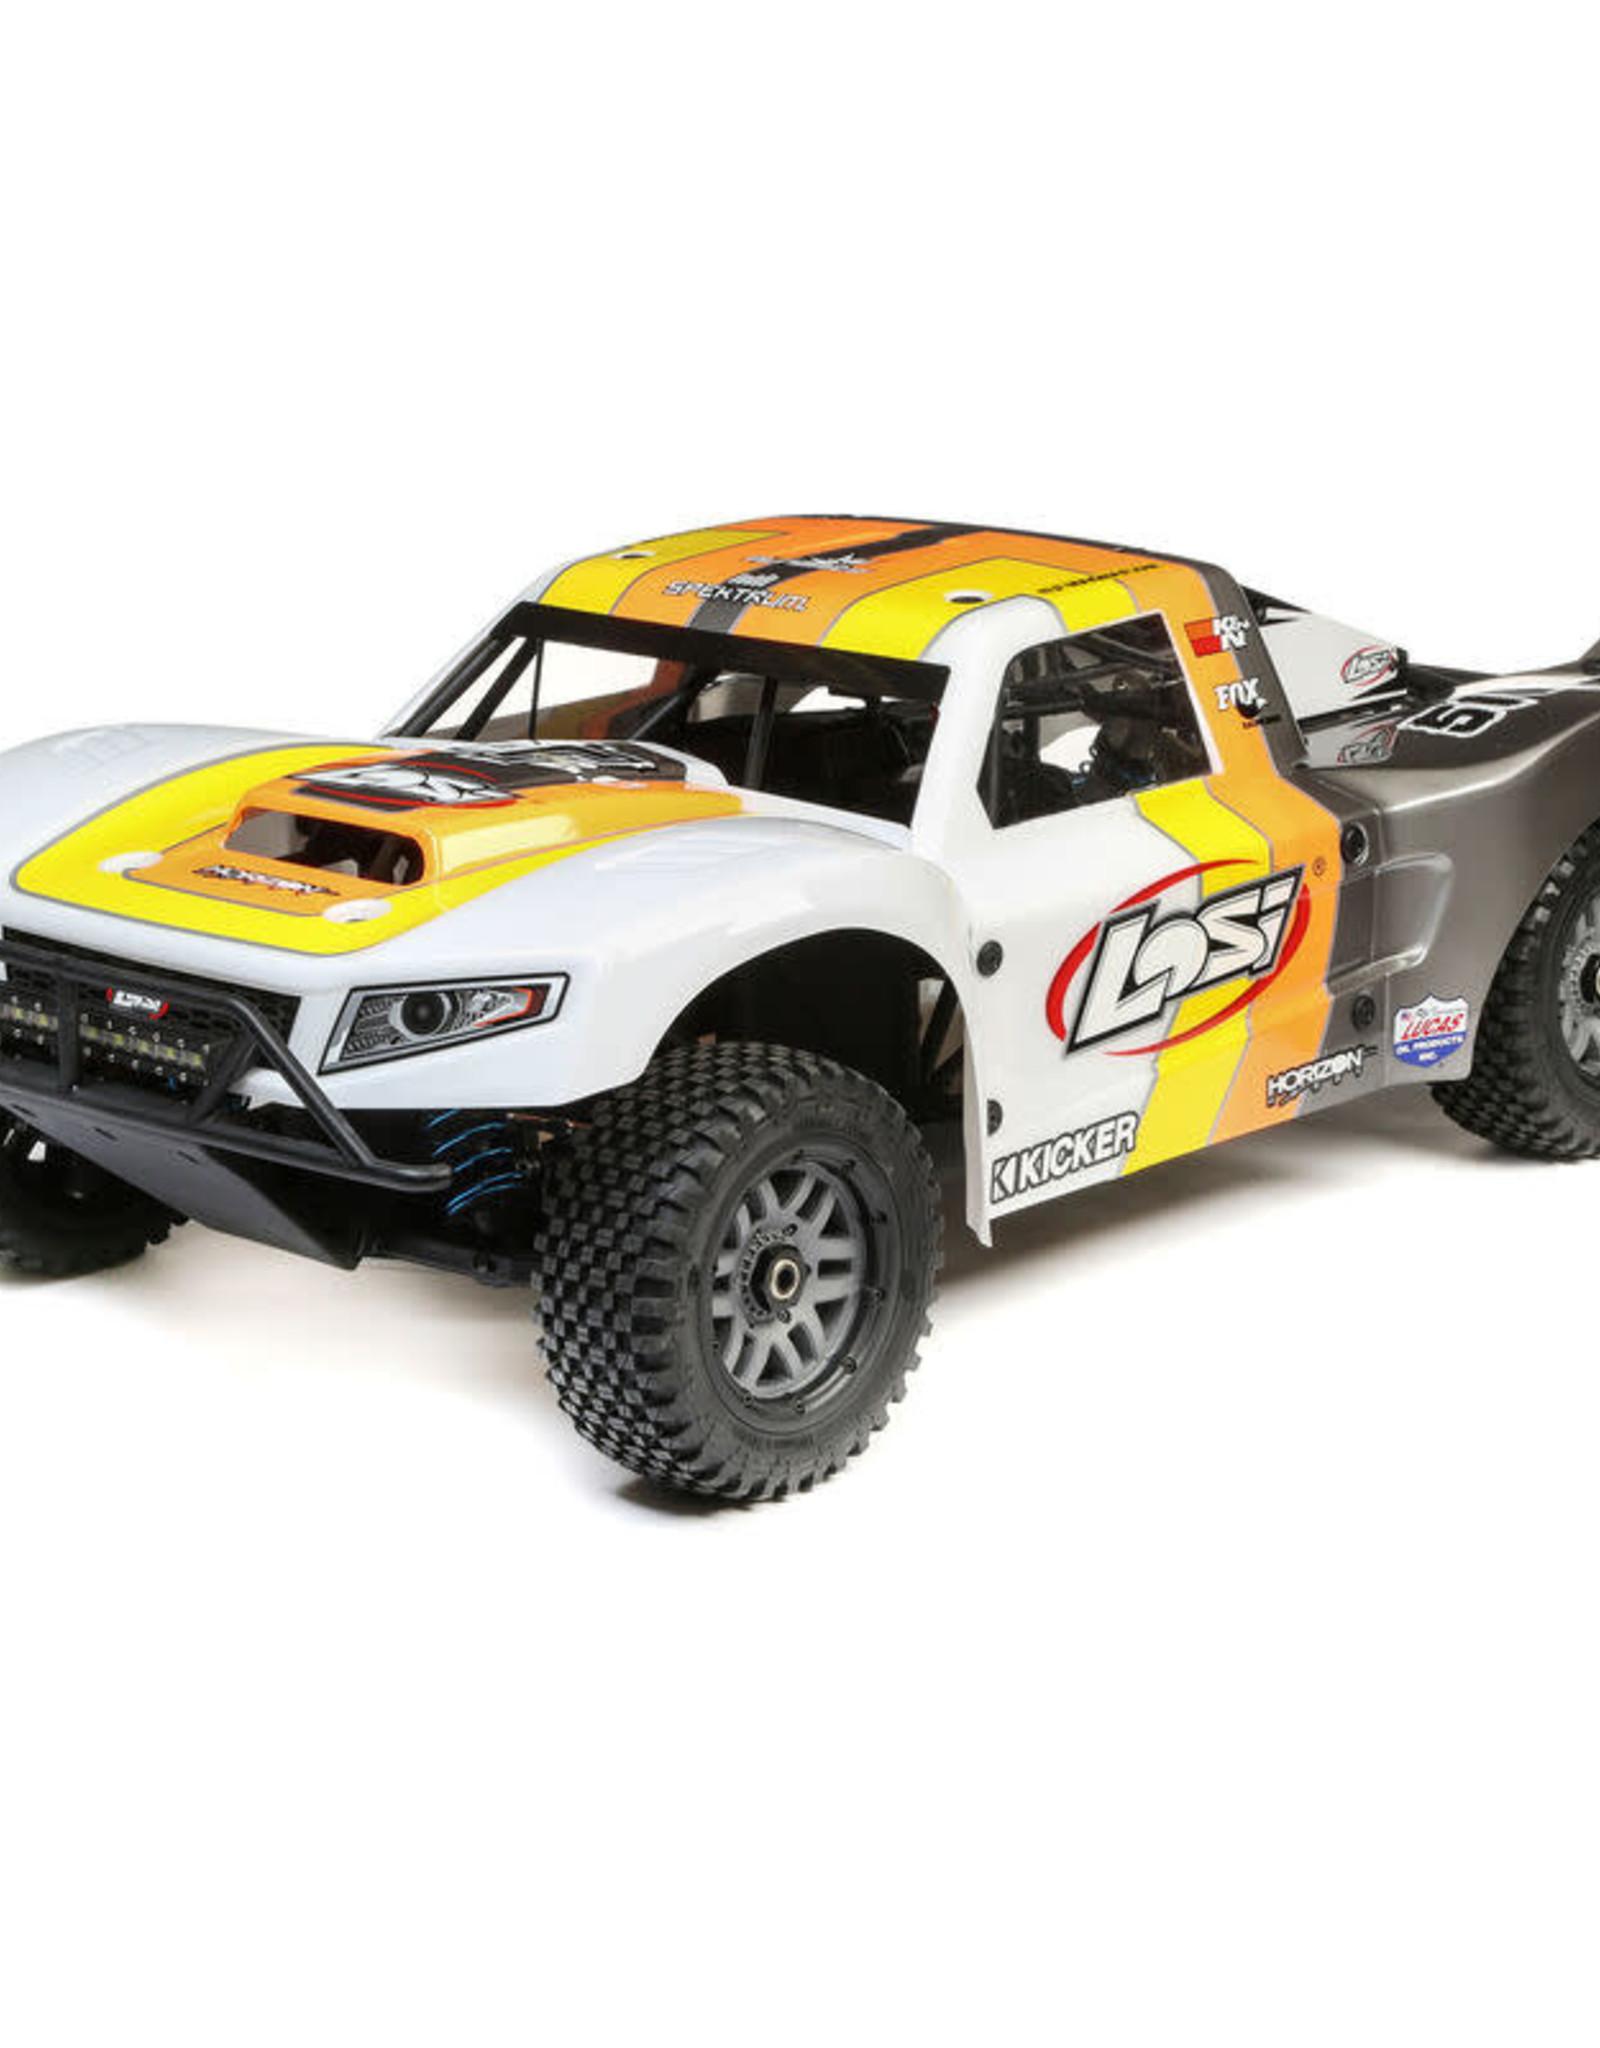 Losi LOS05014T2 1/5 5IVE-T 2.0 4WD Short Course Truck Gas BND, Grey/Orange/White